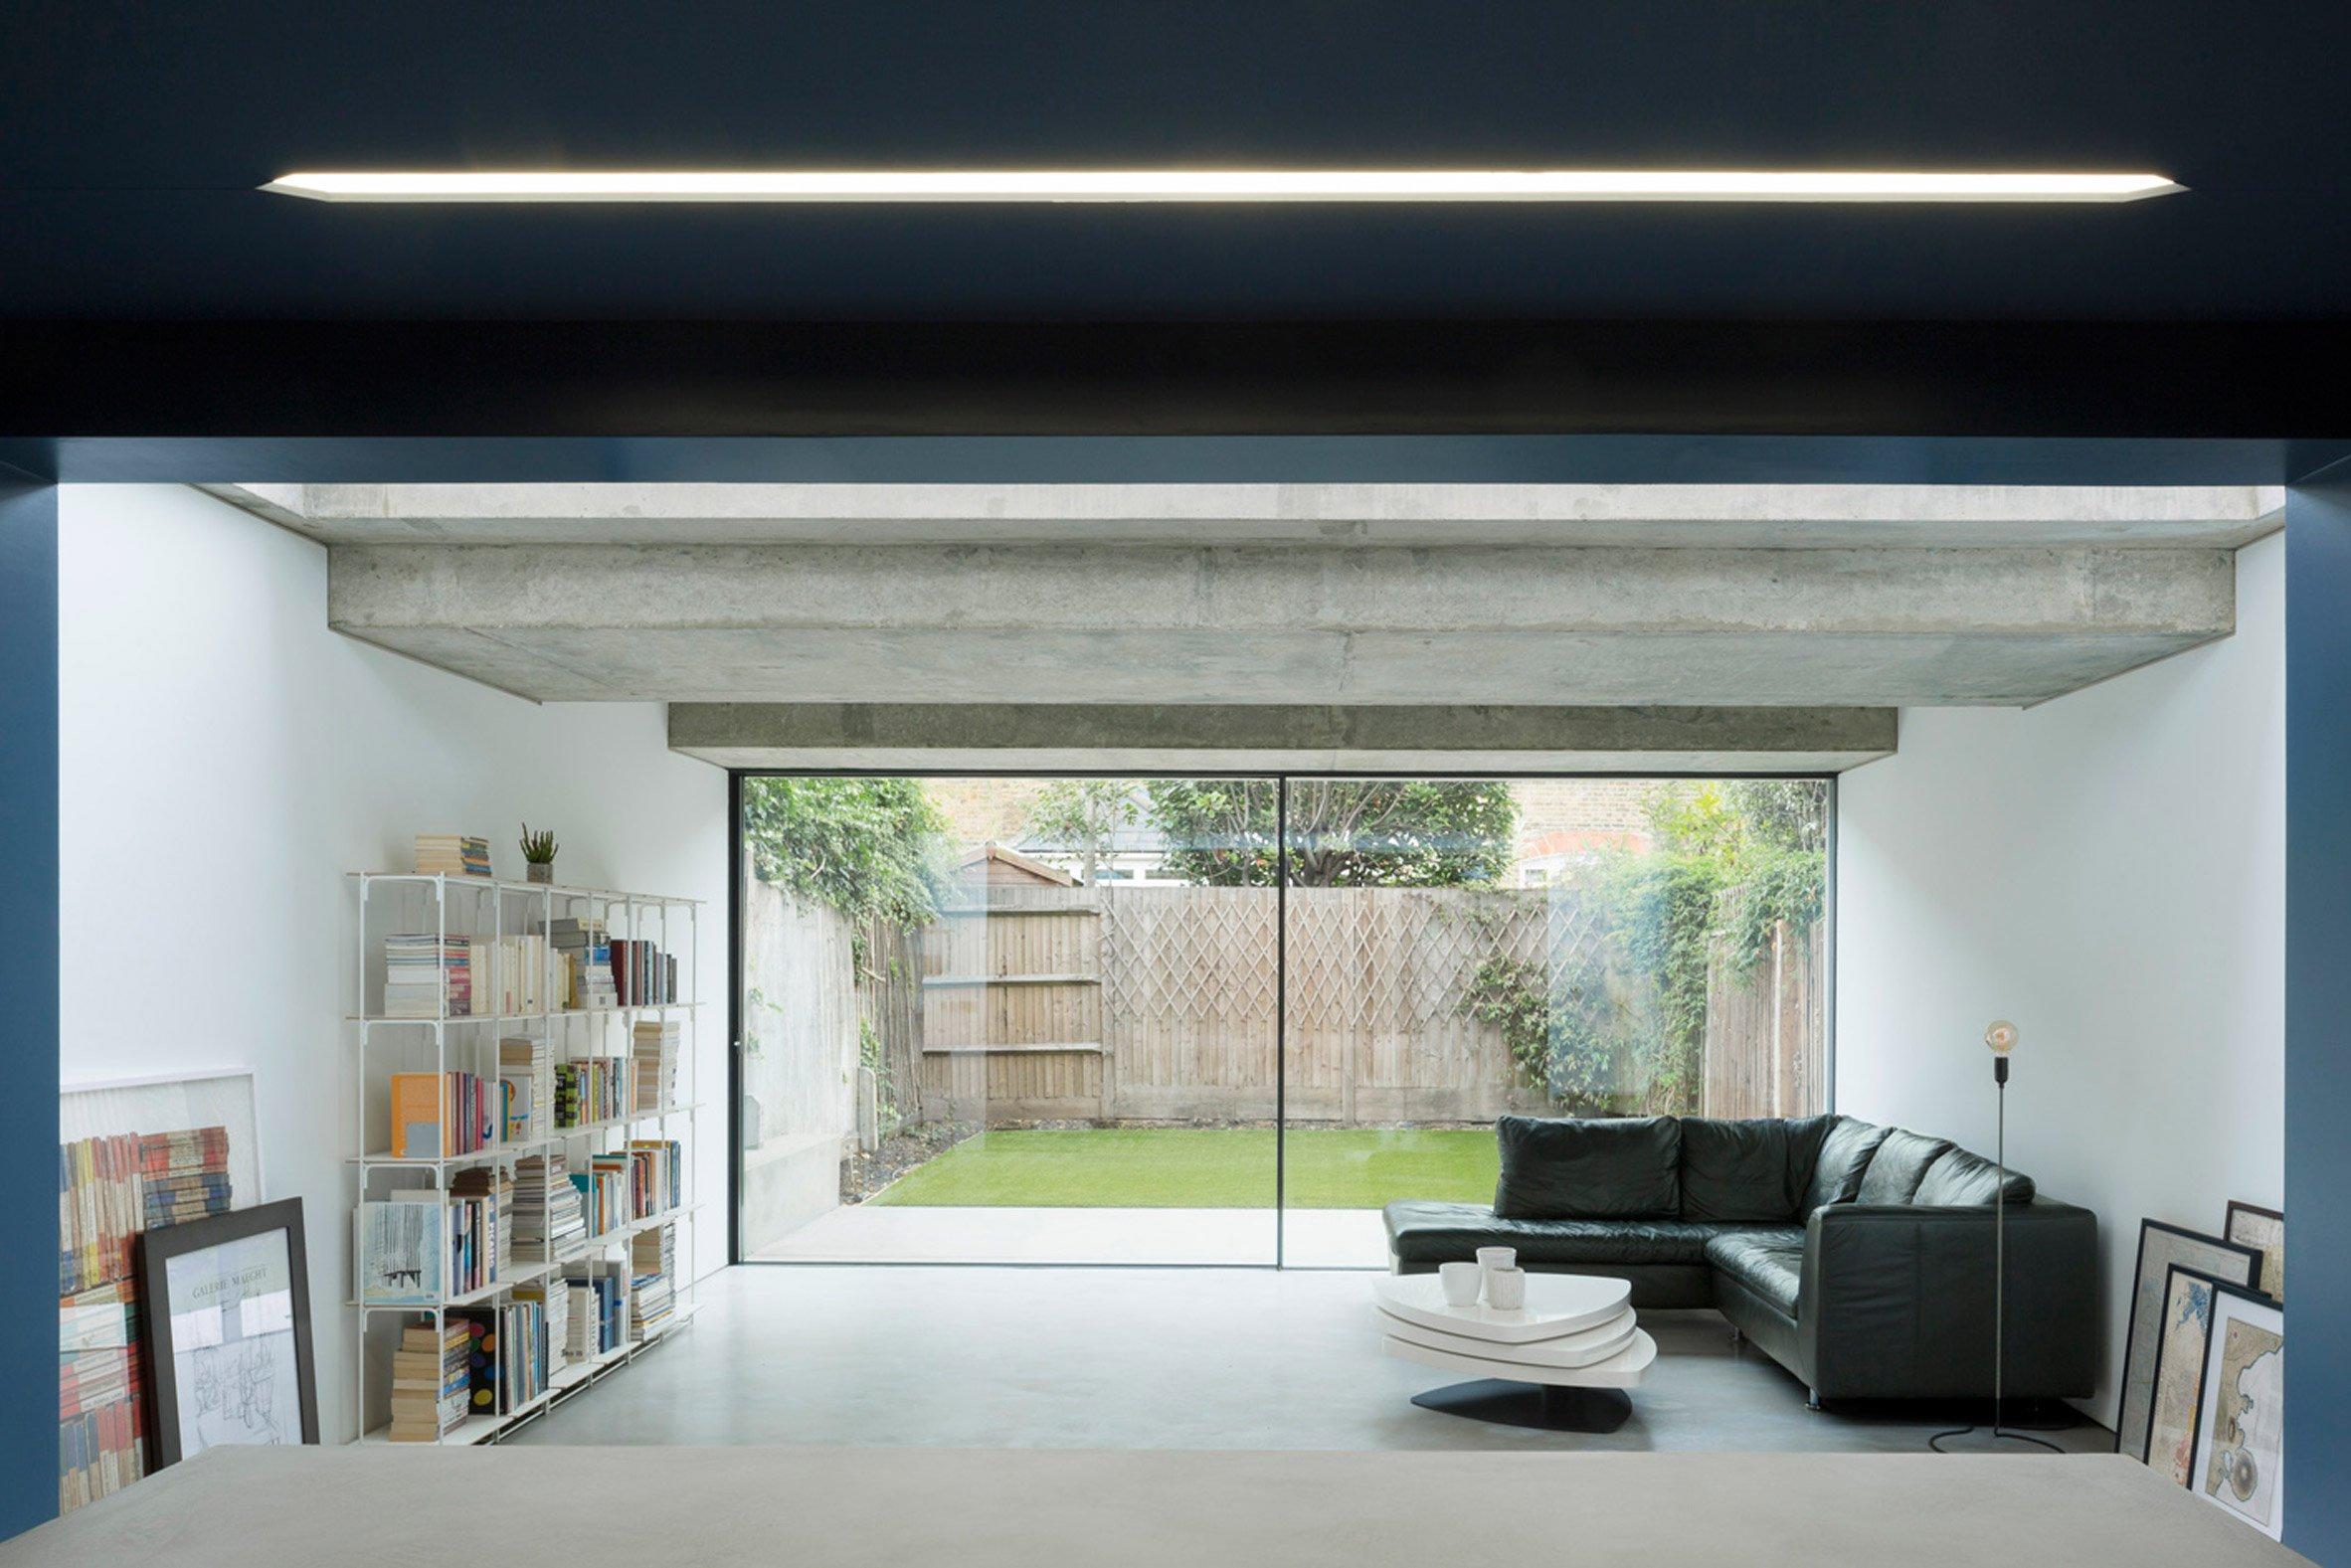 London house extension by Bureau de Change Architects features dark blue kitchen and bright white lounge